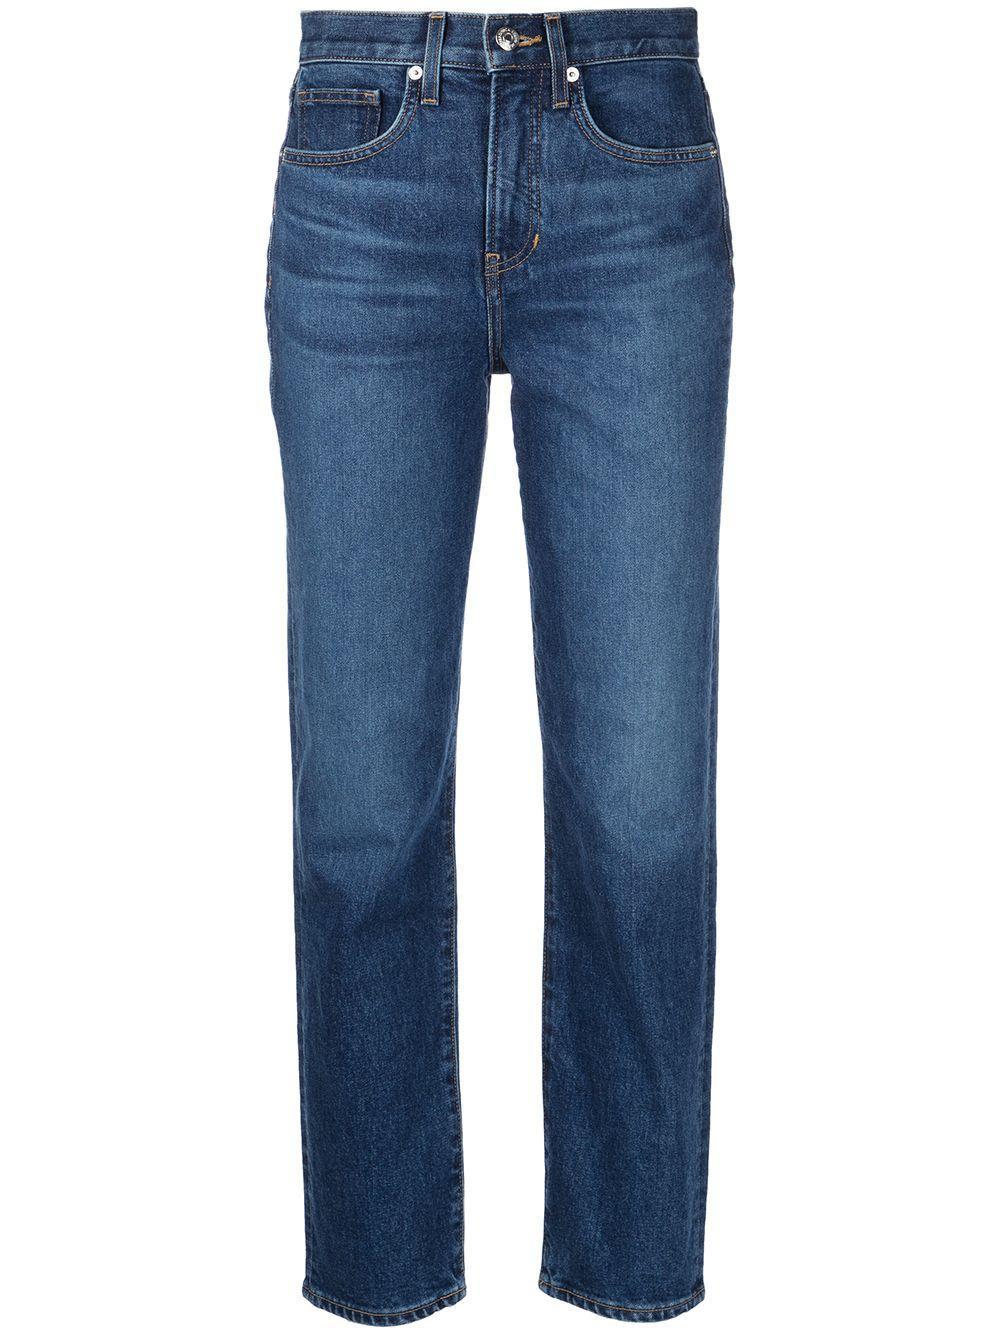 Ryleigh High Rise Slim Straight Jeans Item # J21079340642BB